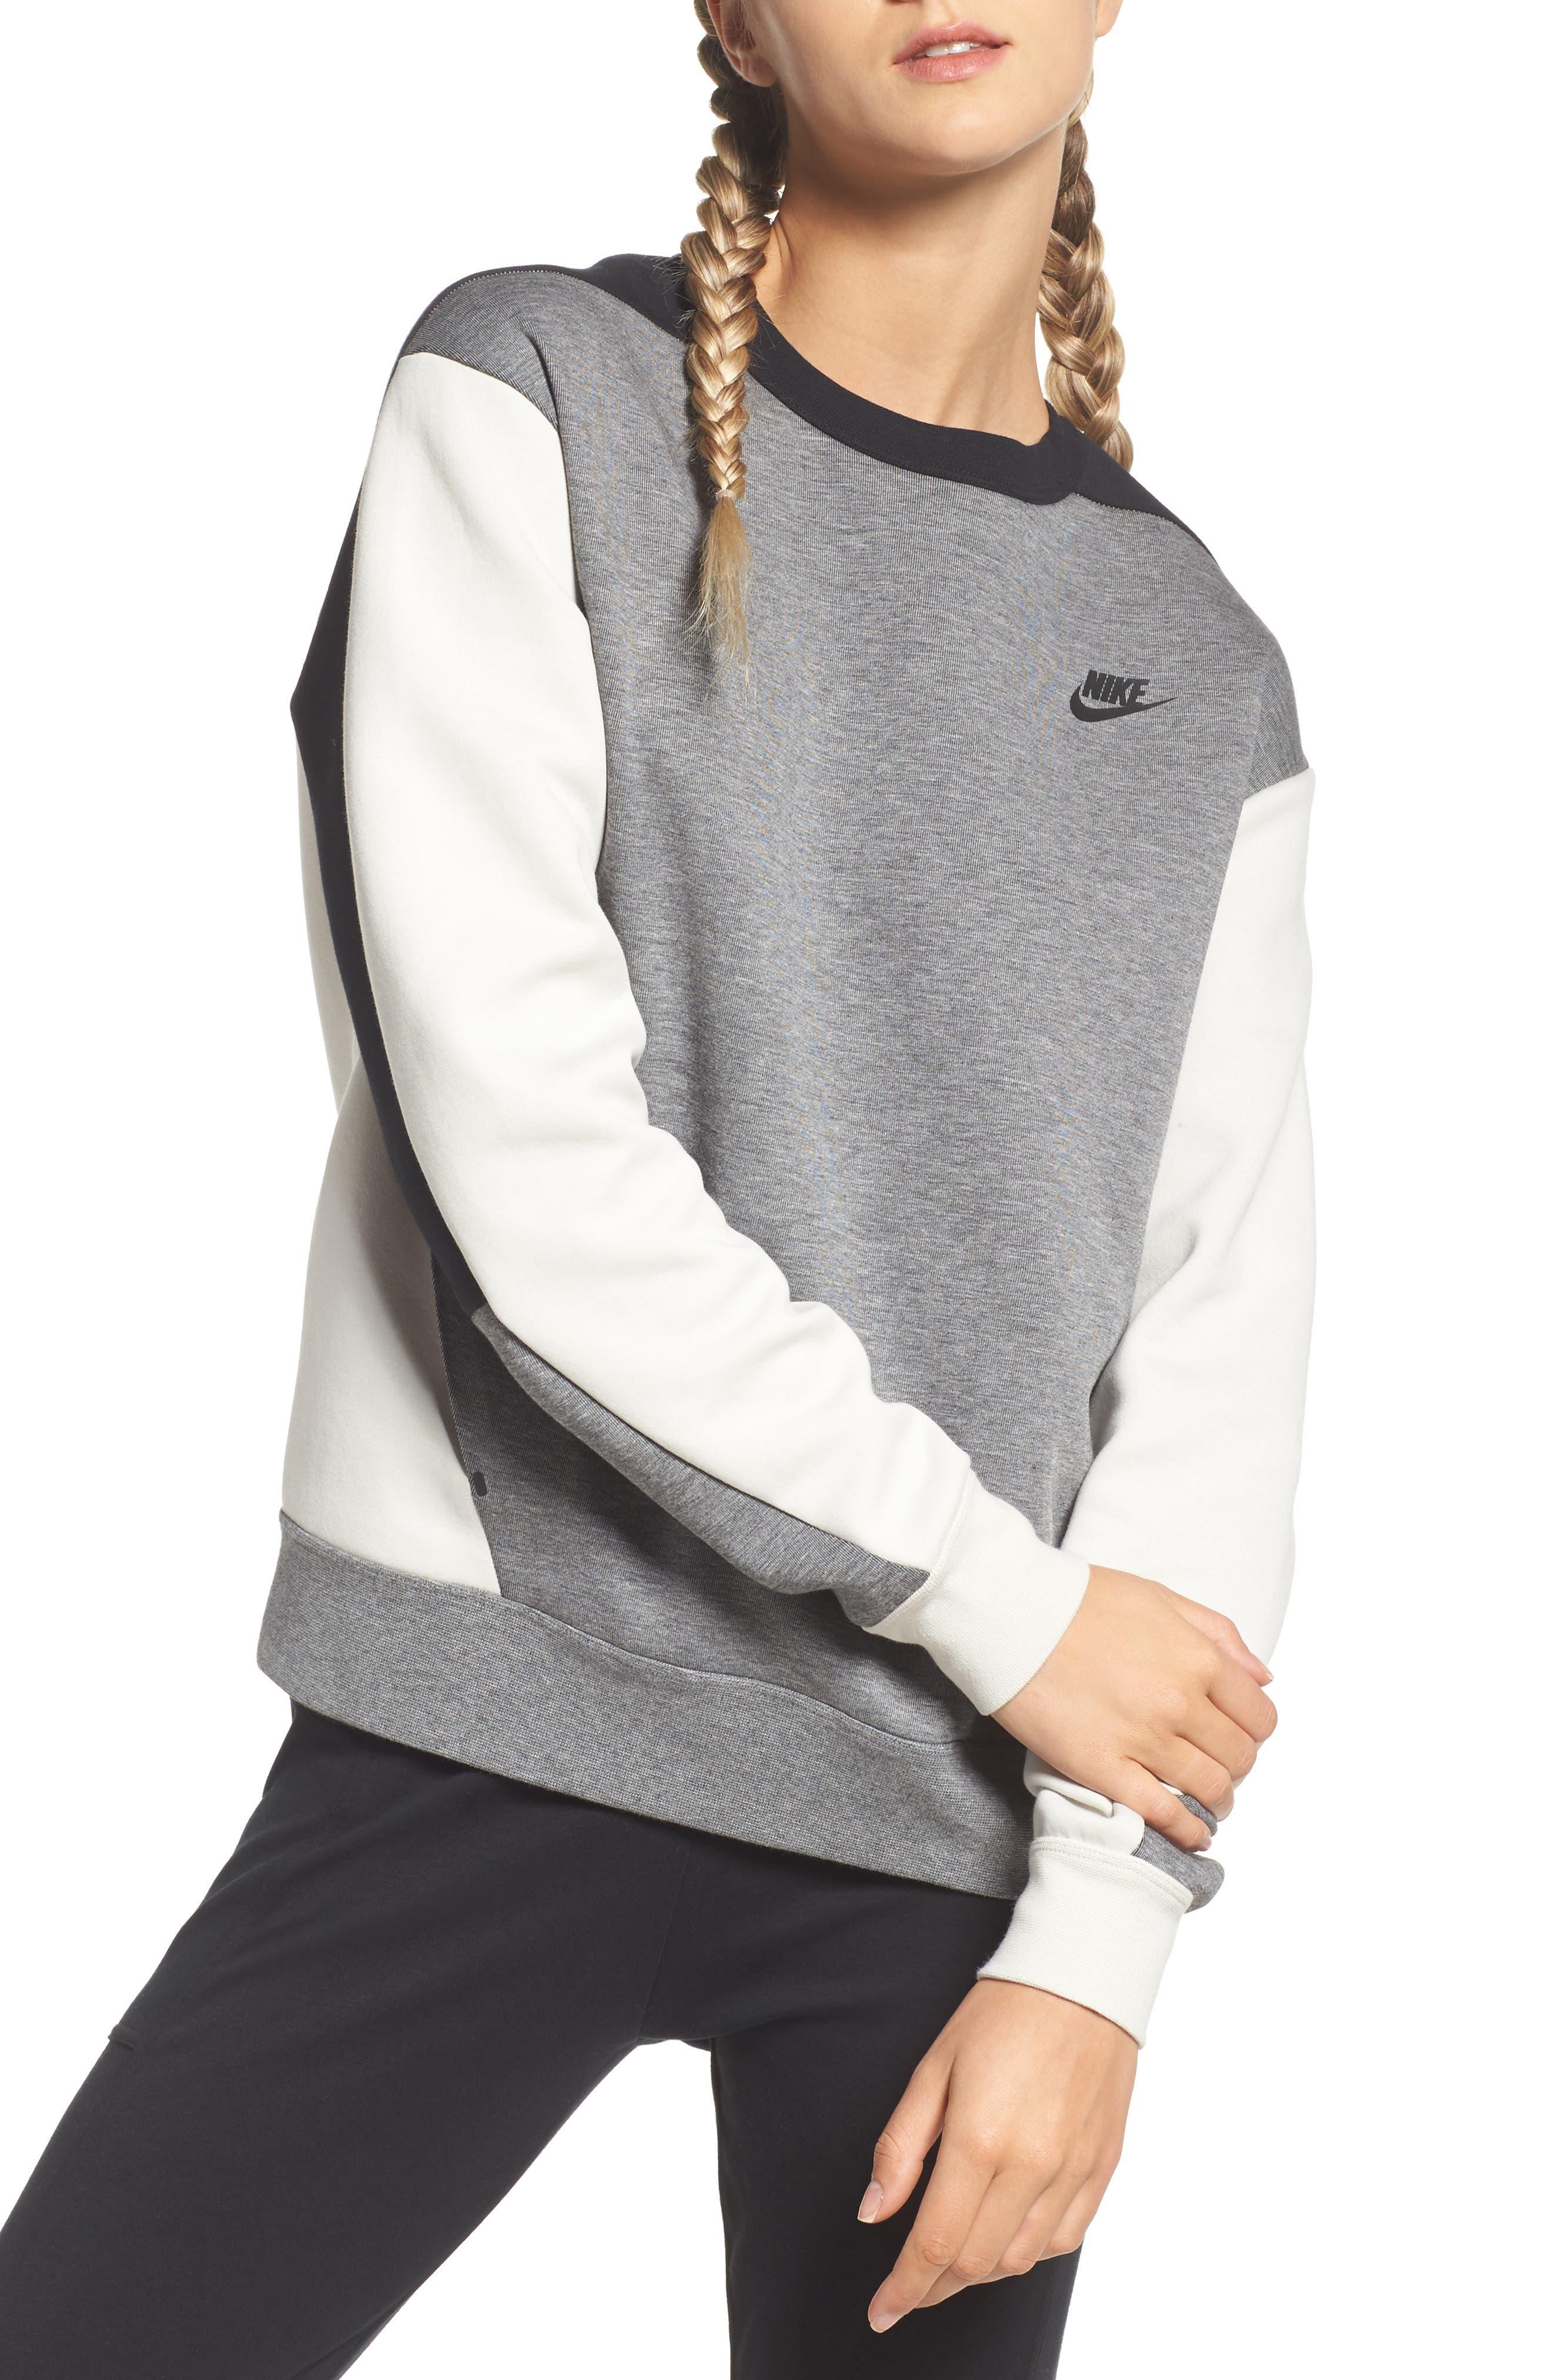 Colorblock Fleece Top,                         Main,                         color, Carbon Heather/ Bone/ Black